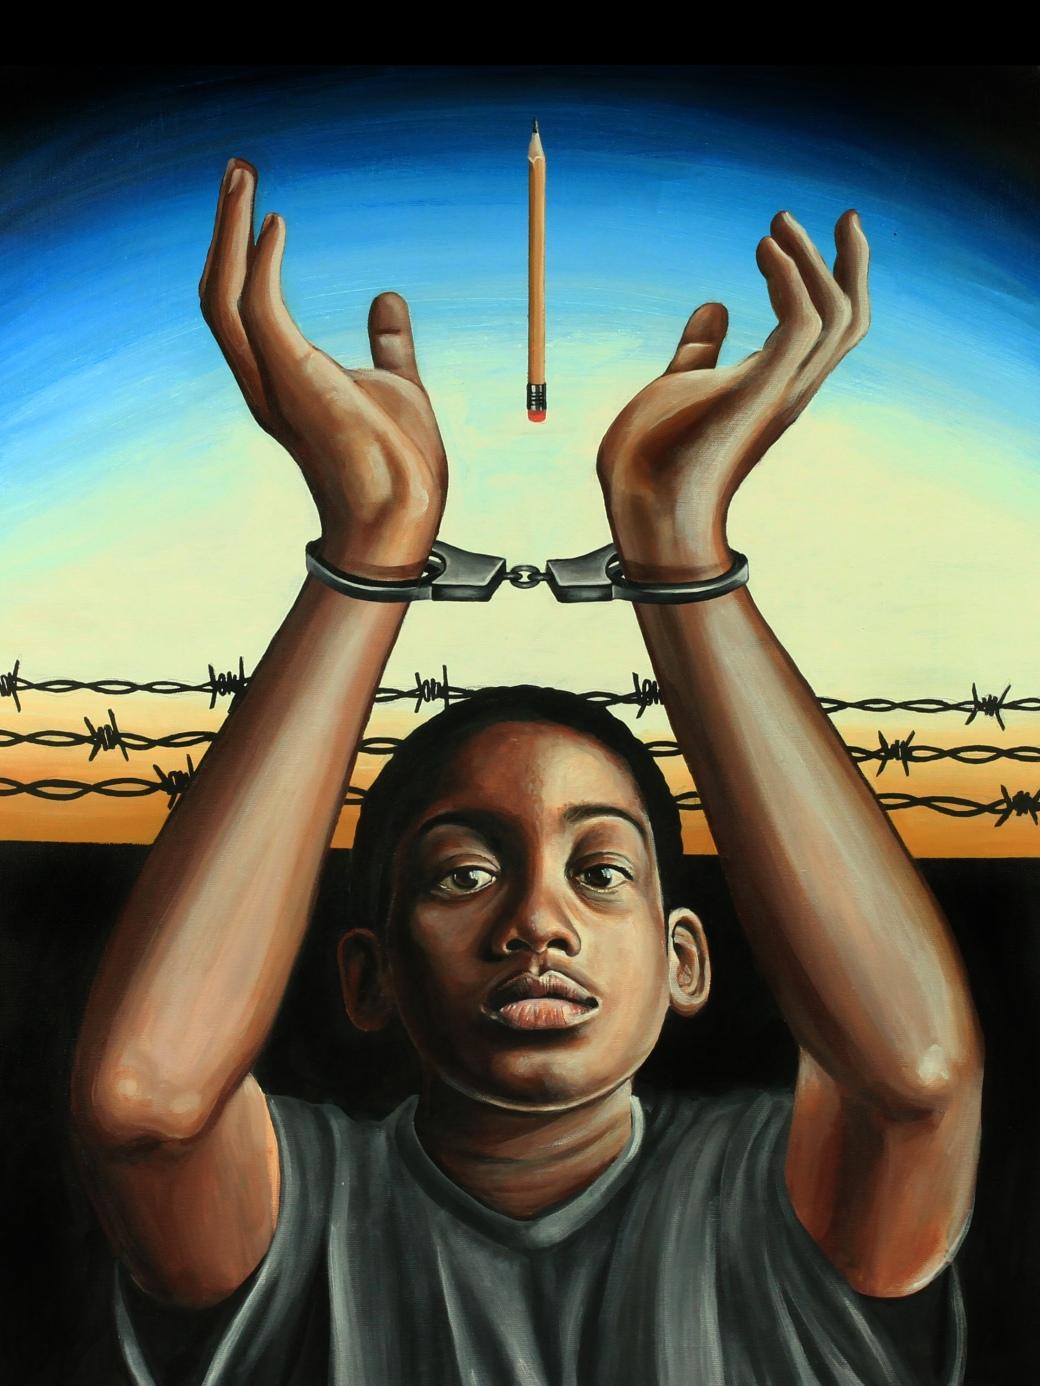 large_mata_ruda_bound_hands_prisons_amplifier-1